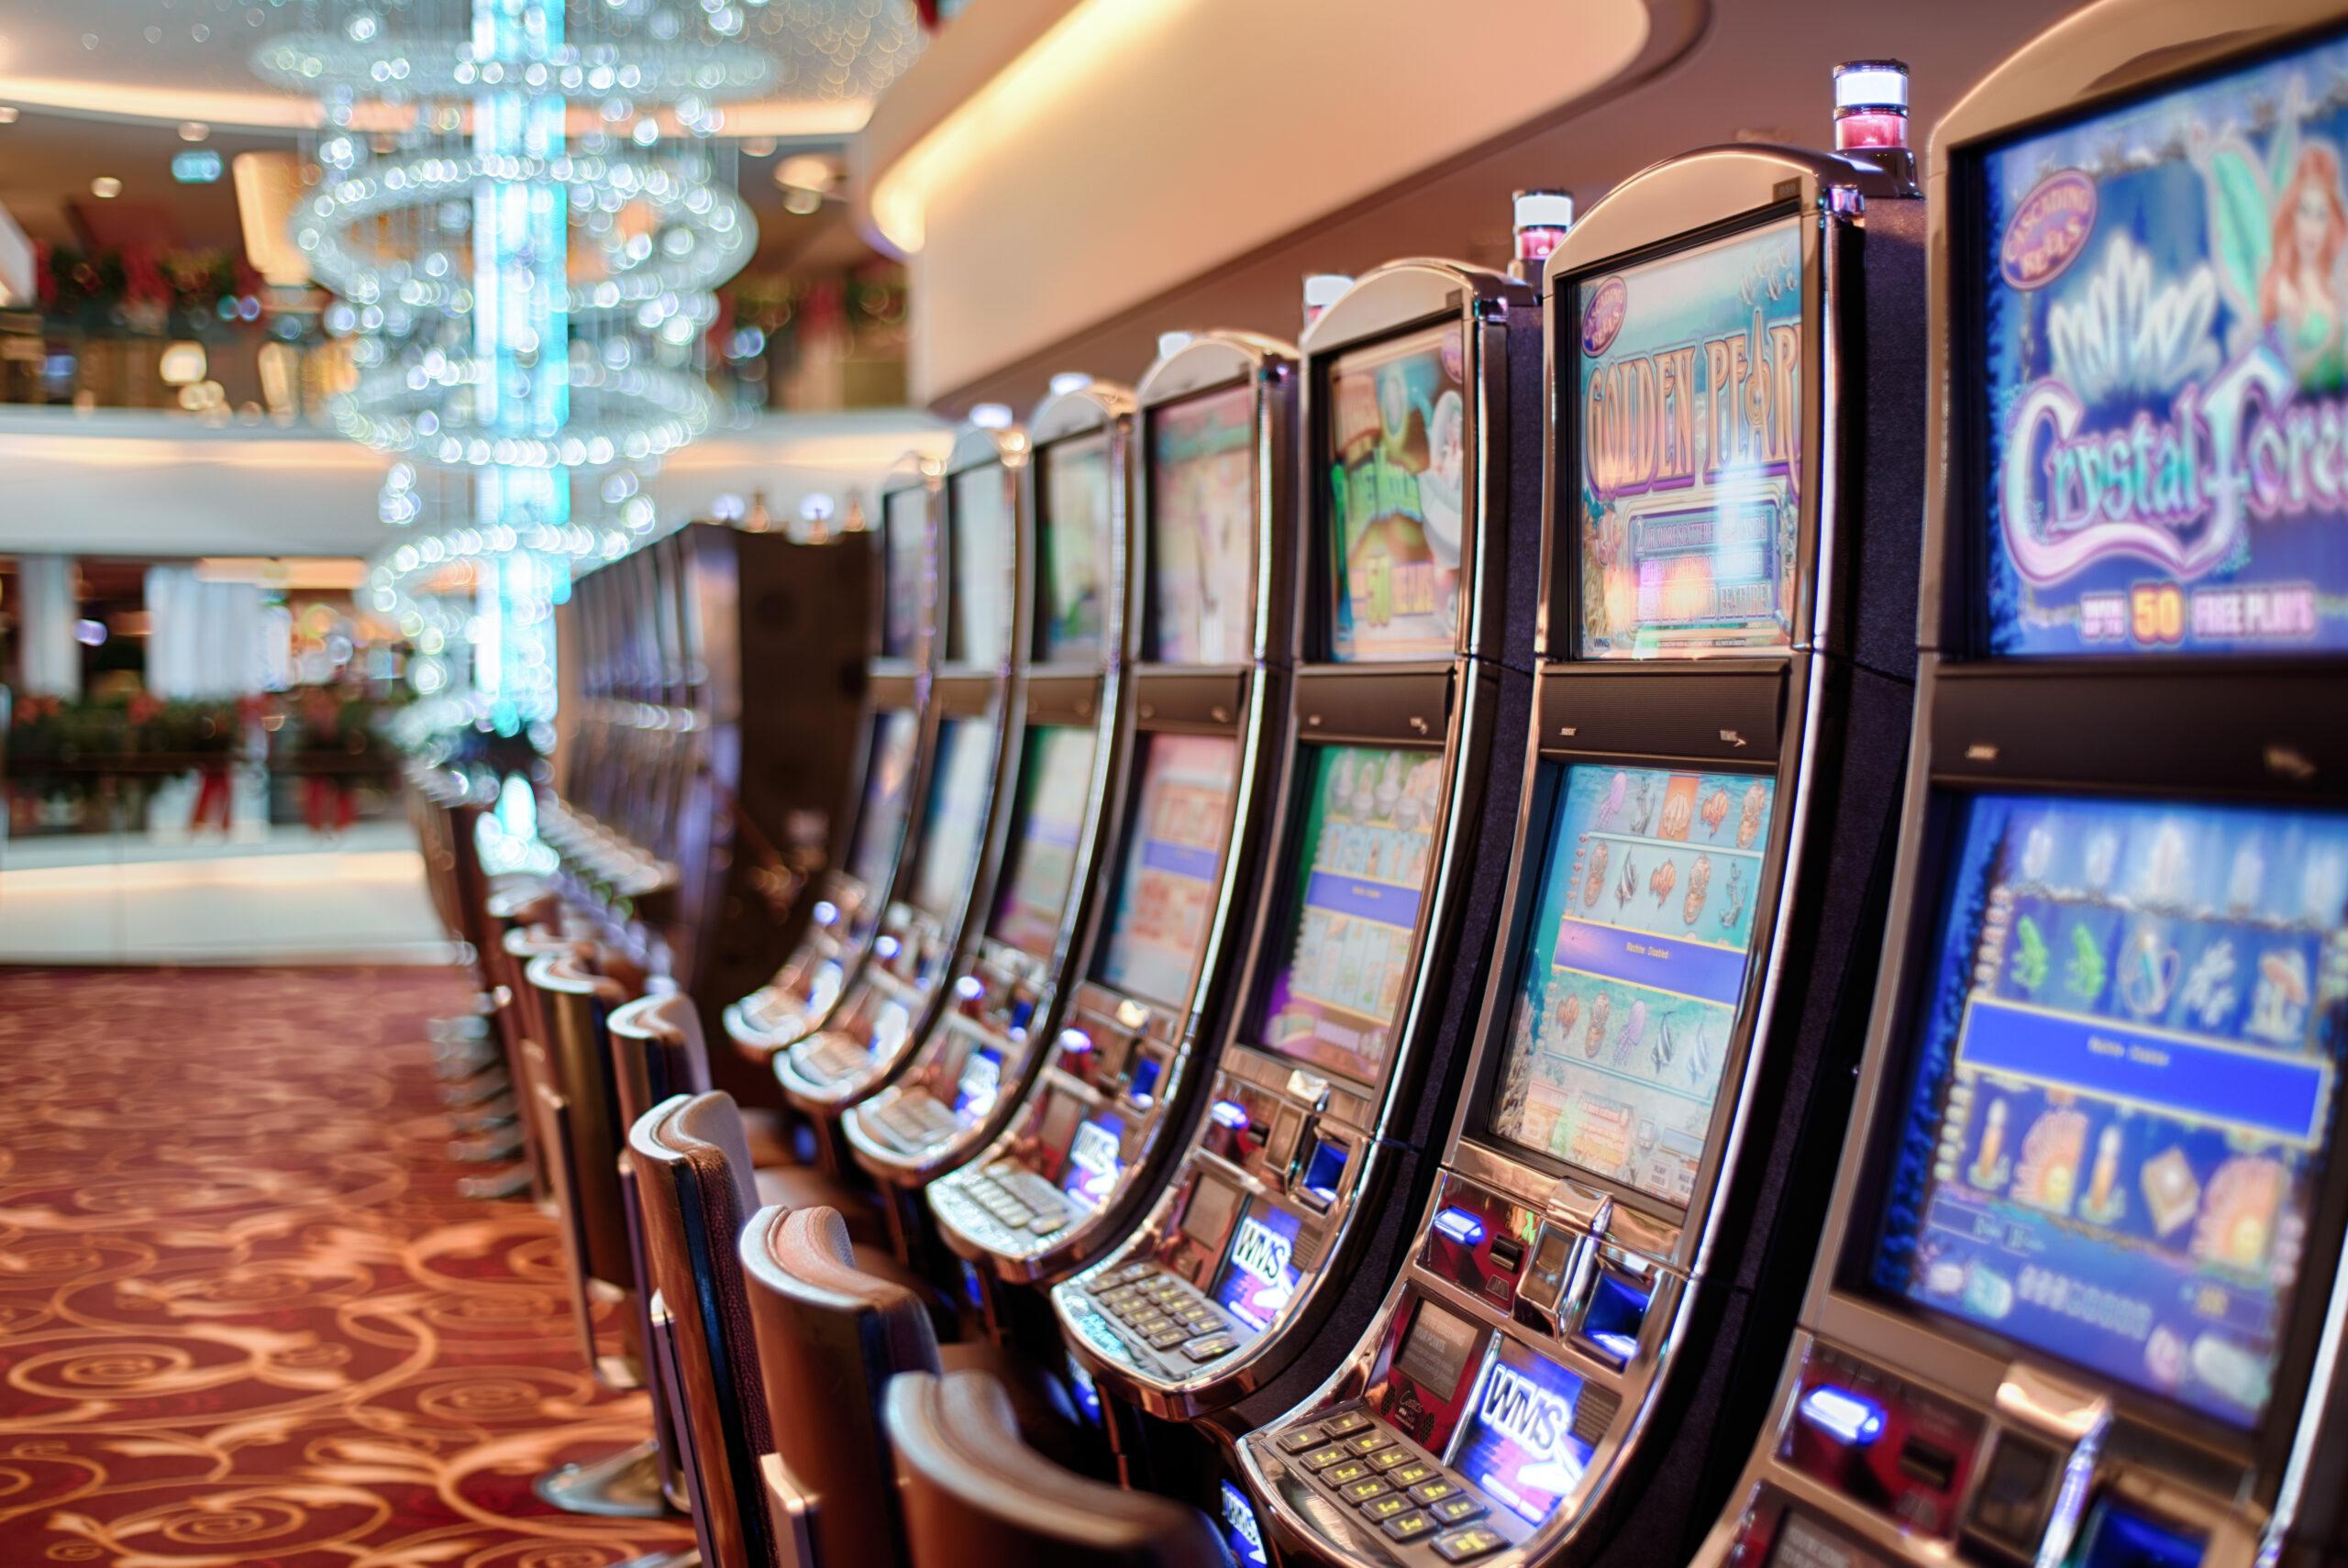 Row Of Empty Slot Machines In Hotel Casino